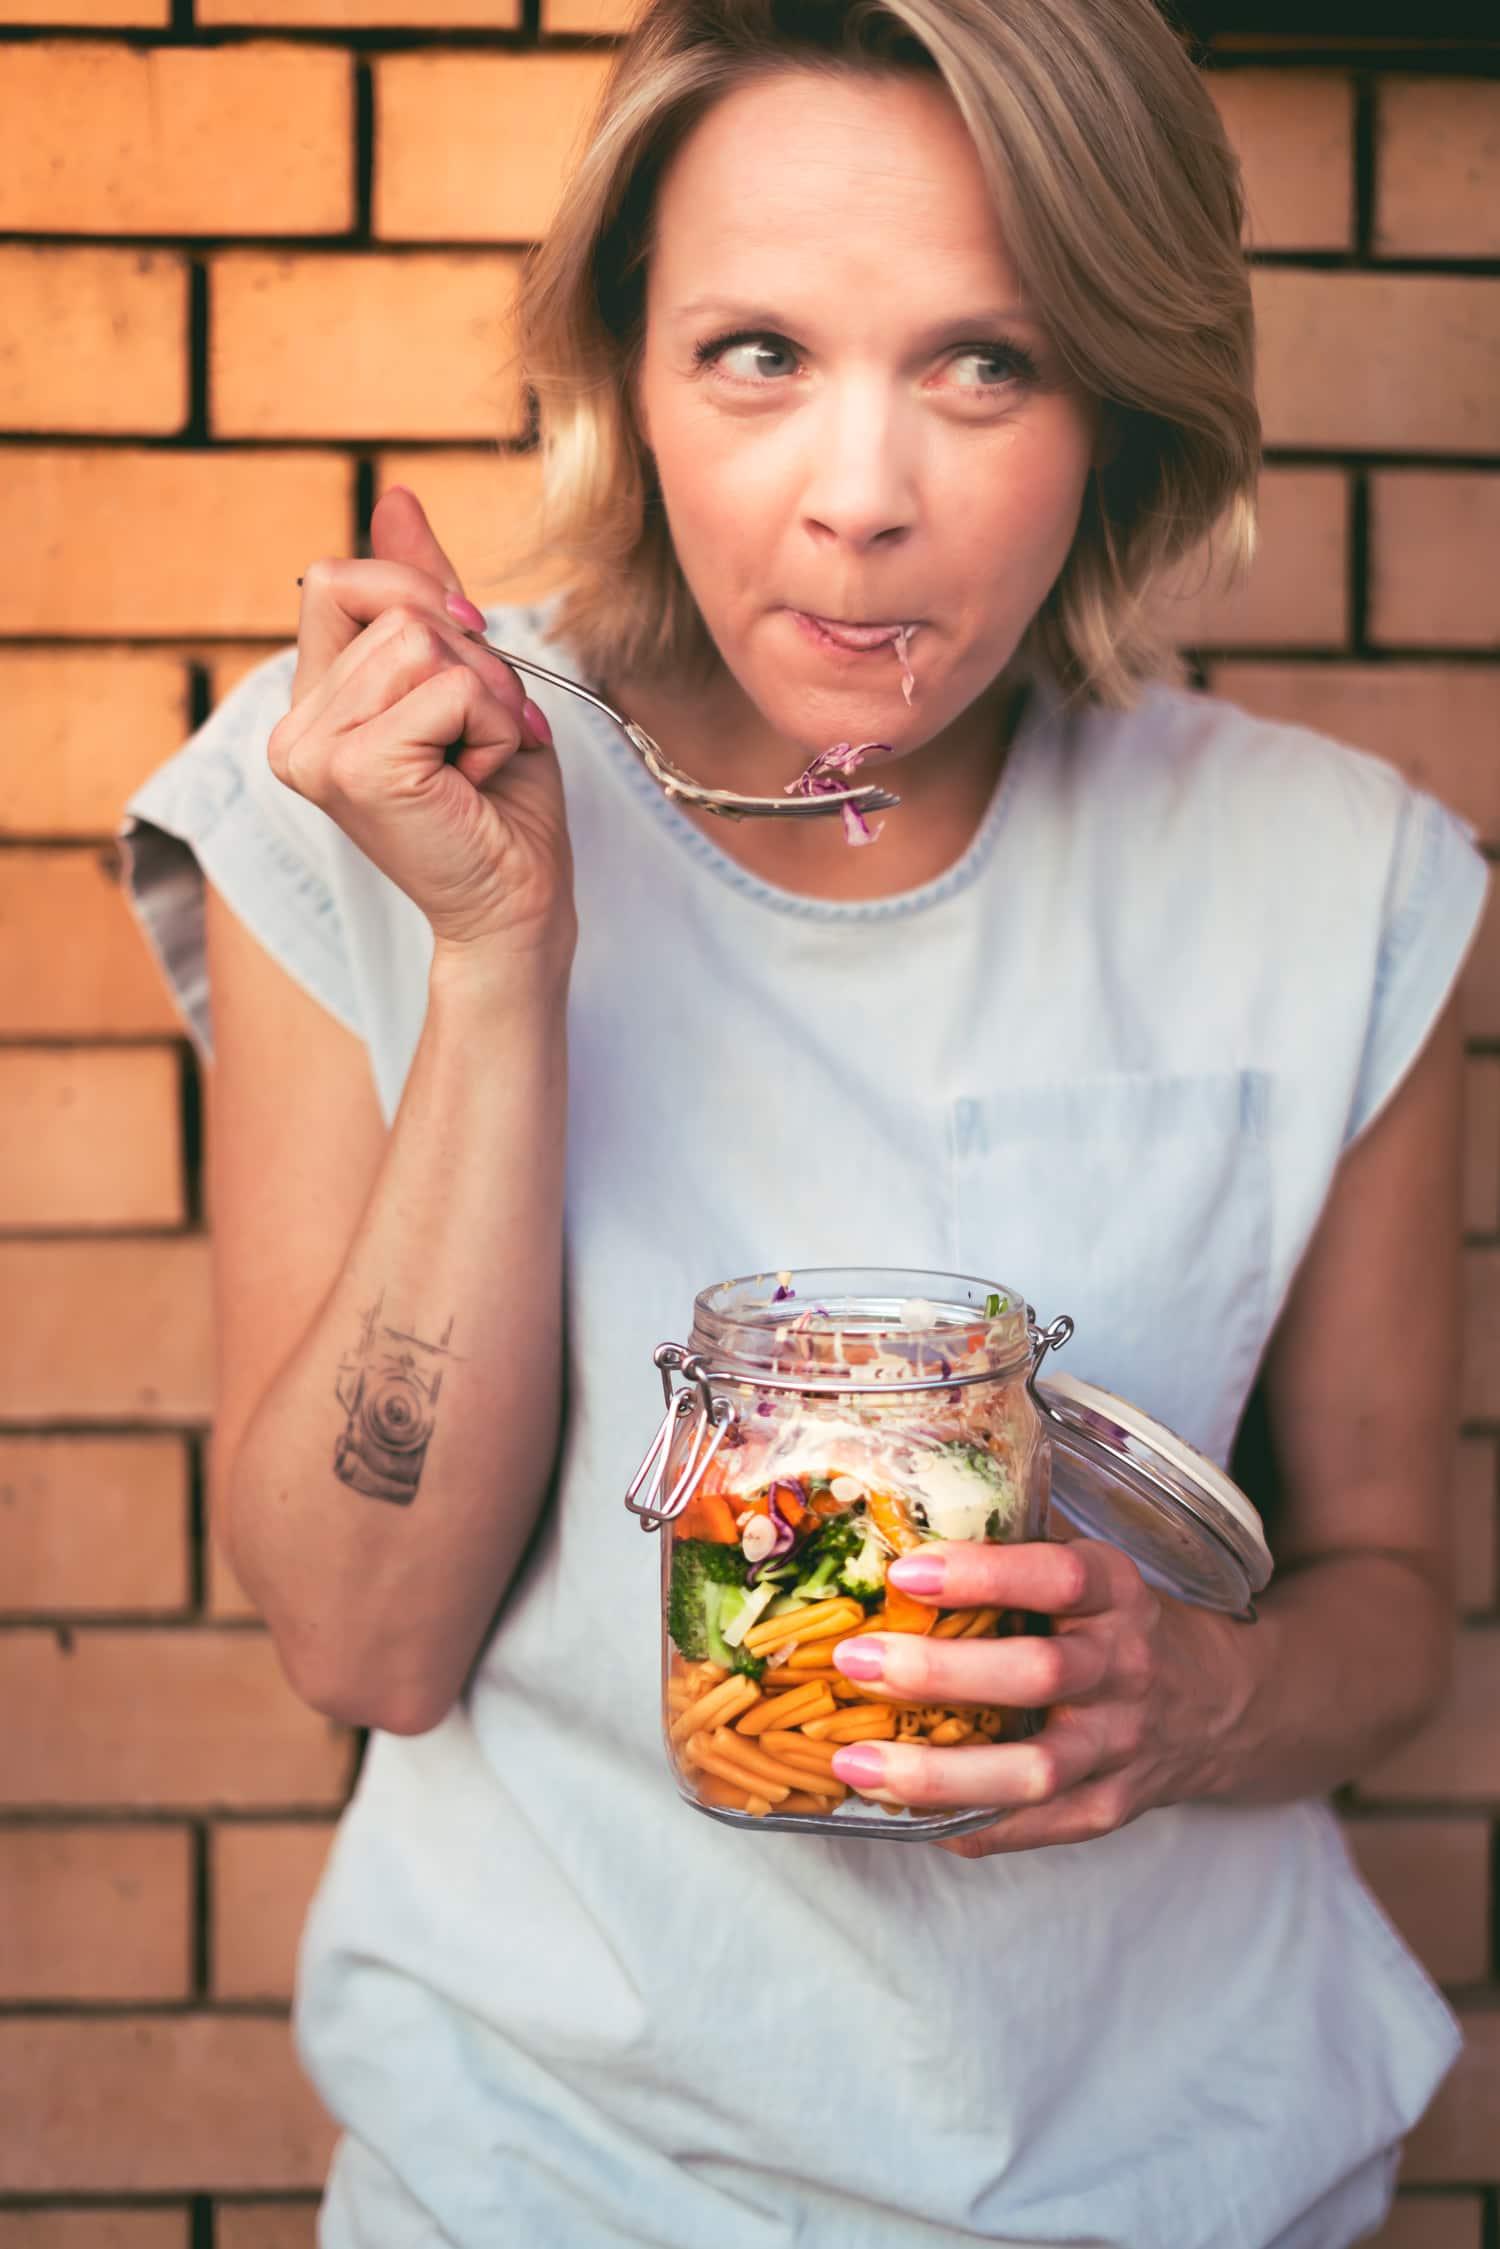 Stephanie Reinicke von happy.mood.food www.plantifulskies.com und veganer Nudelsalat